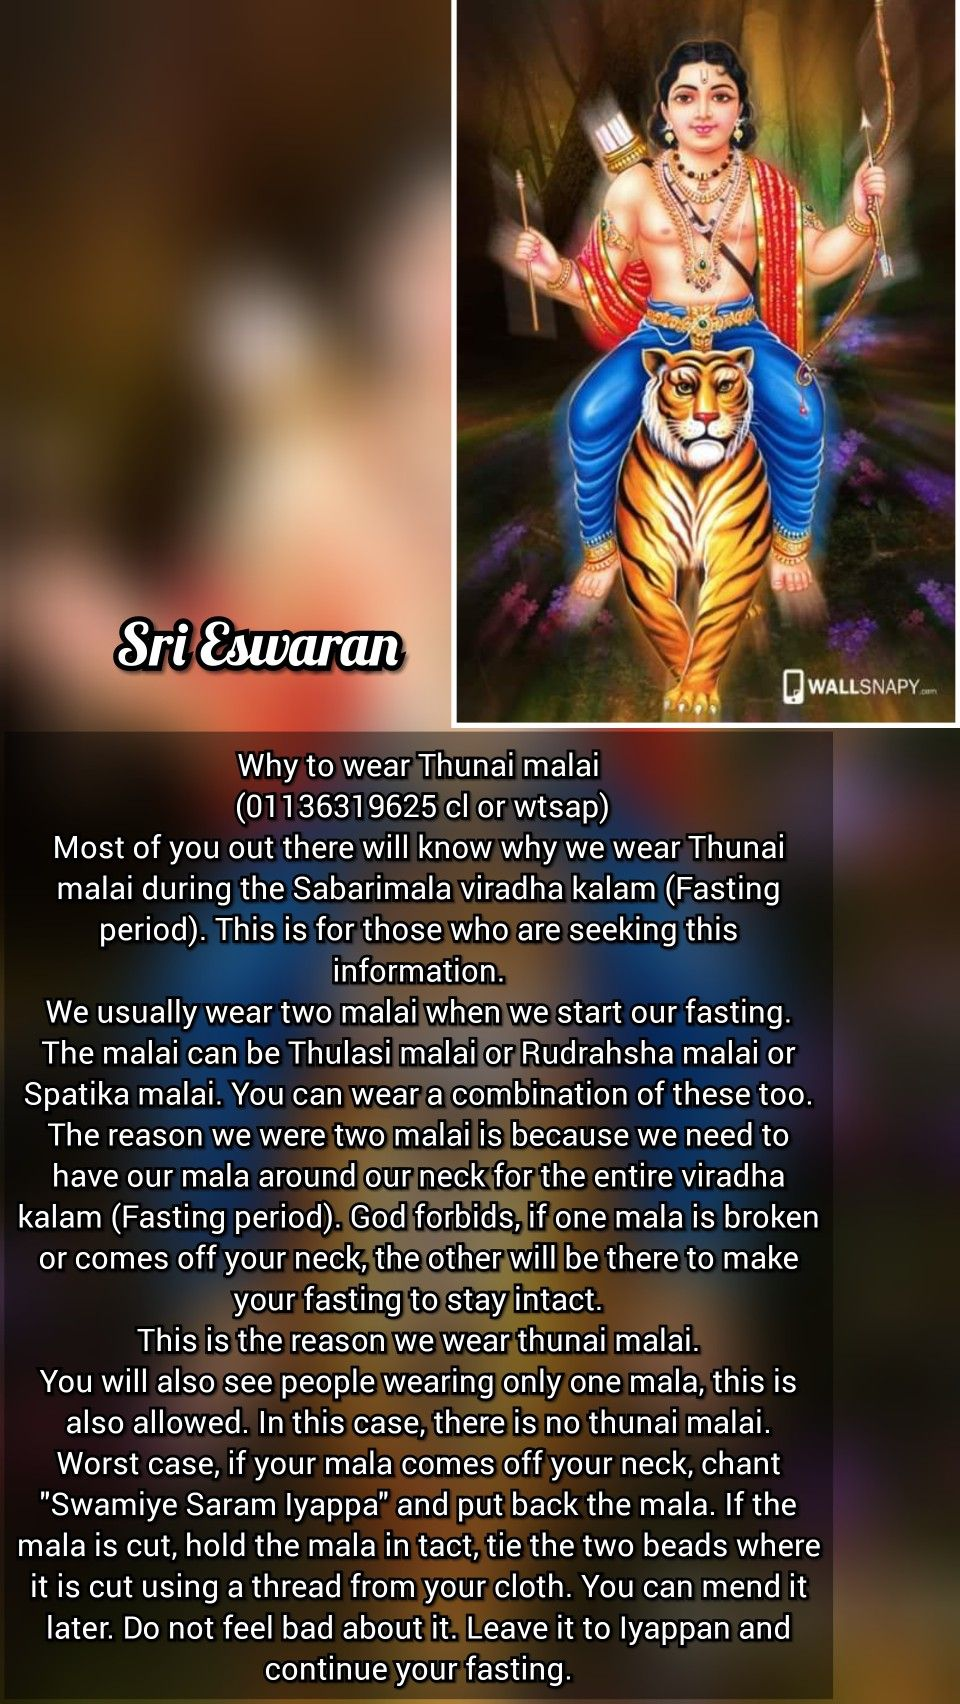 Pin By Sri Eswaran On Eswaran Remedies Movie Posters Movies Poster